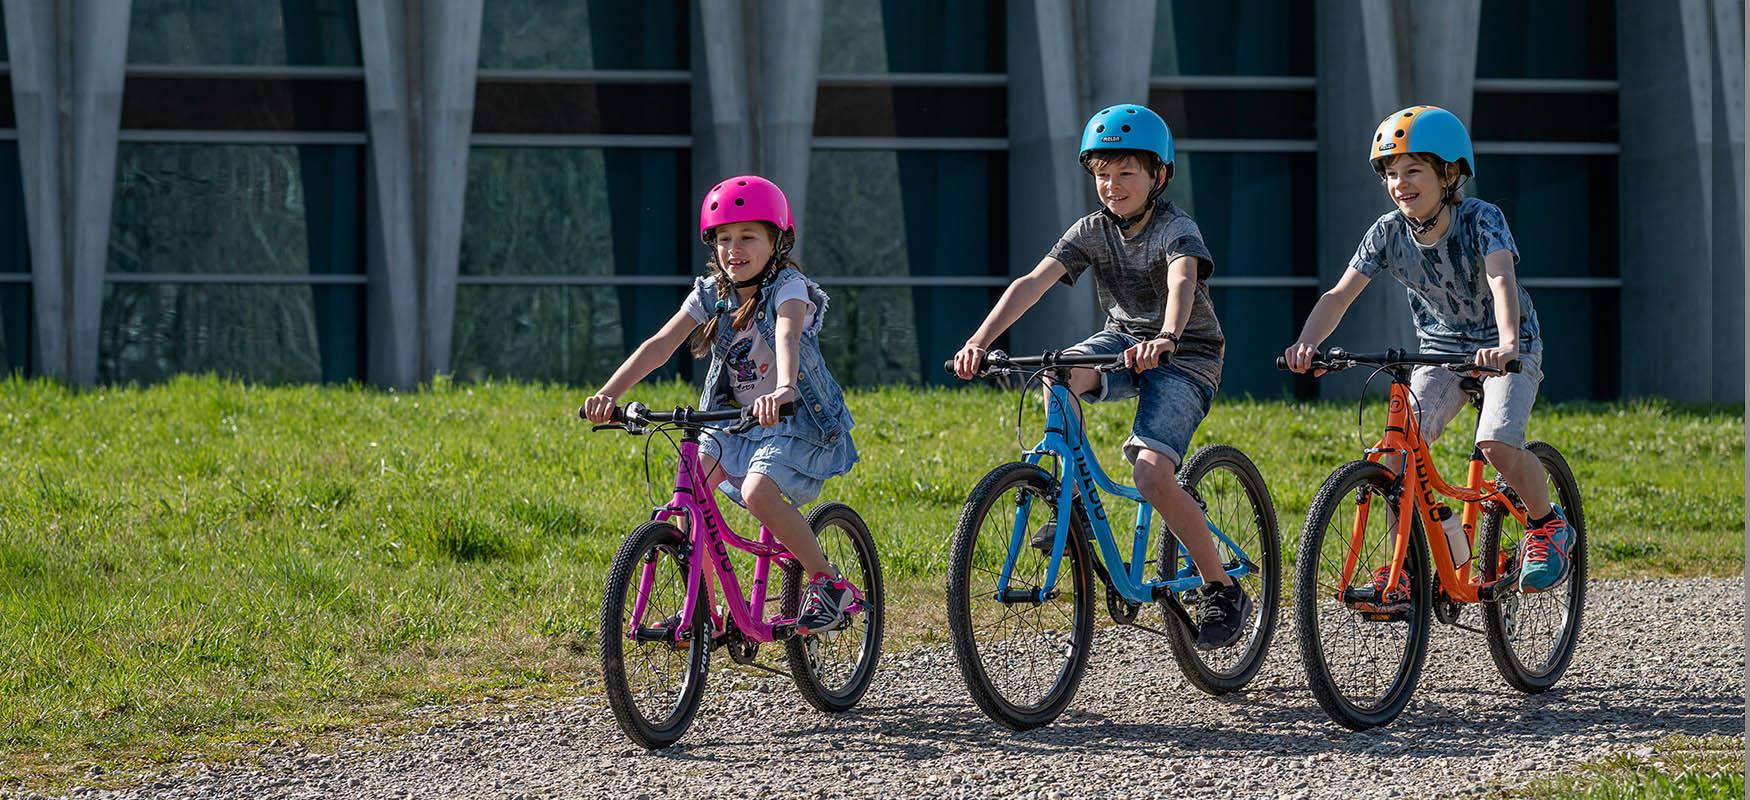 Naloo Kinderfahrrad Onlineshop im Saarland